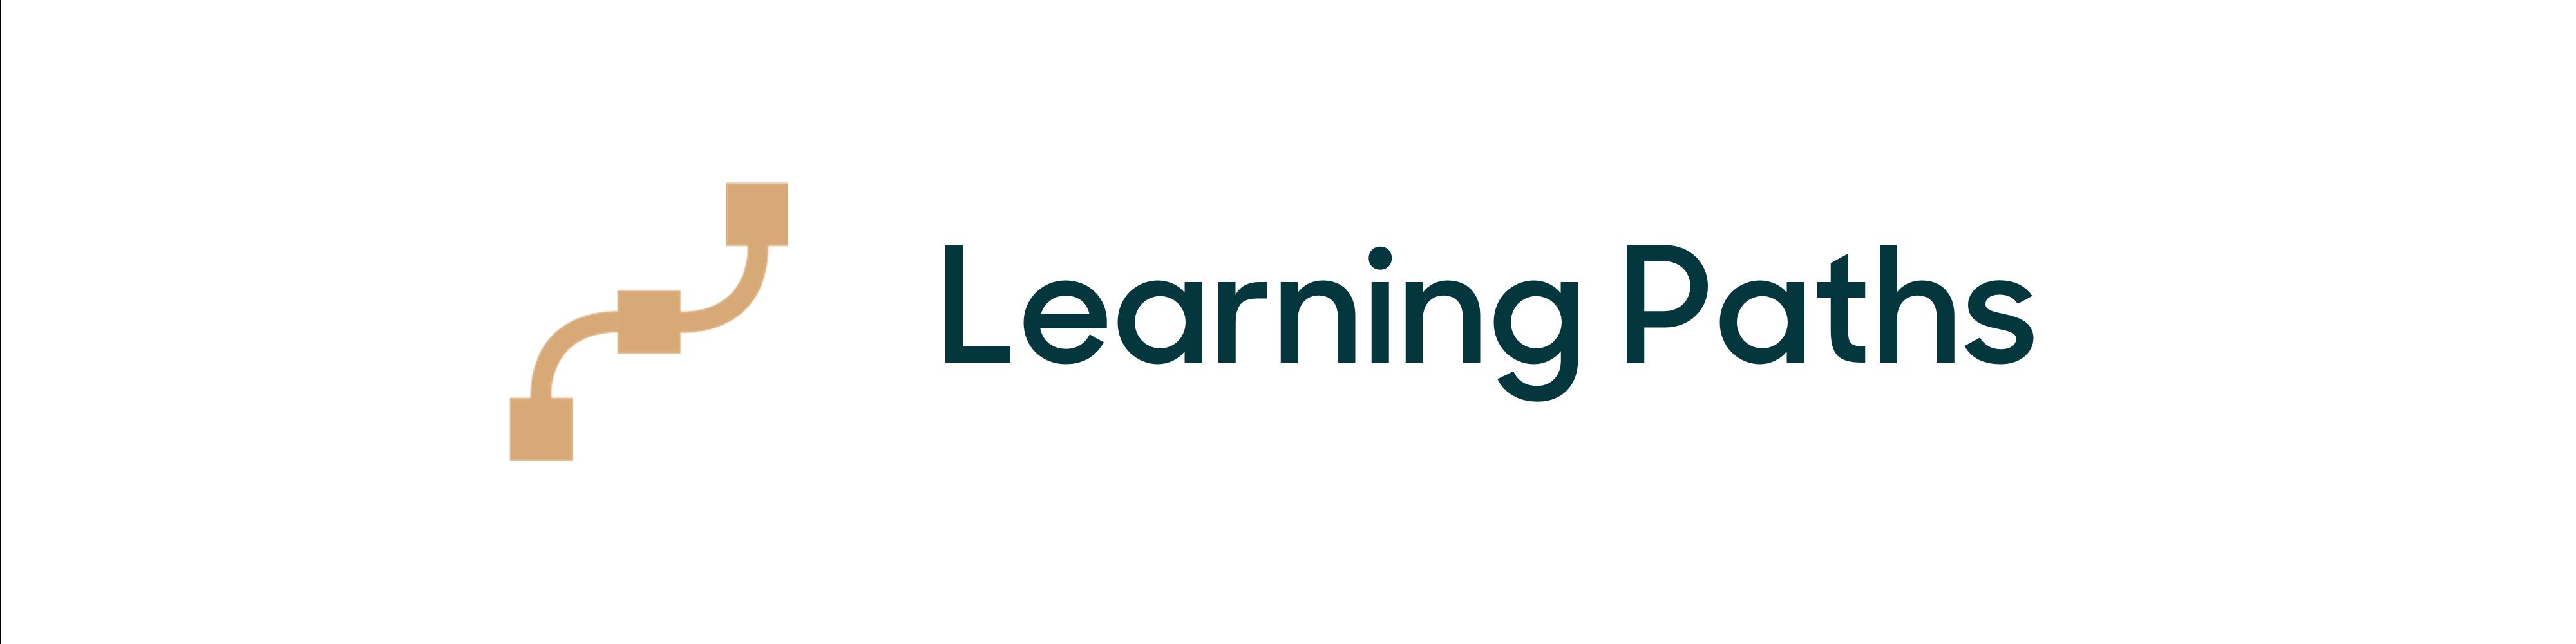 Zendesk Learning Paths